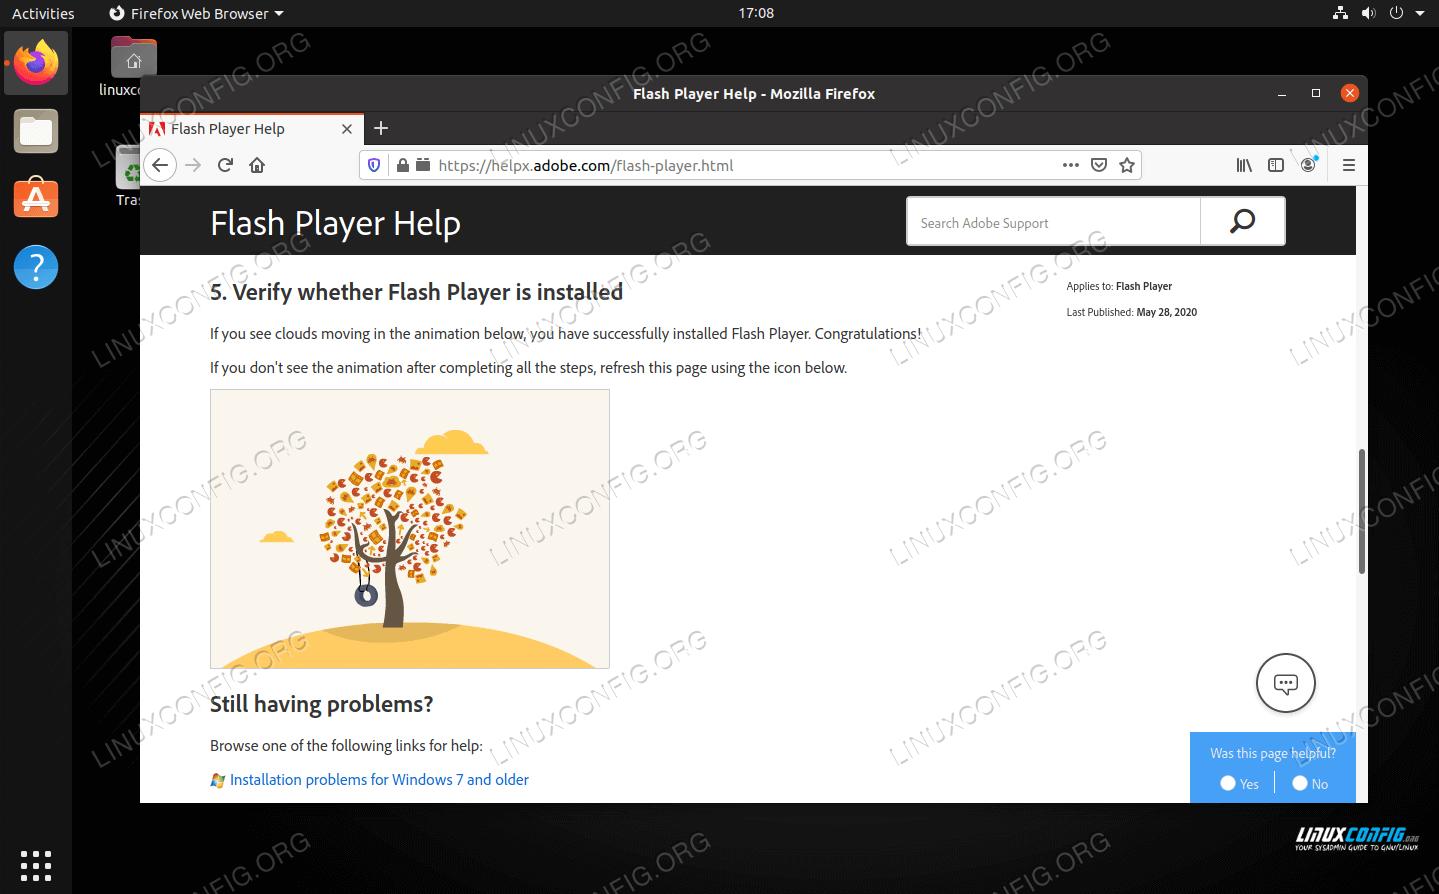 Adobe Flash running successfully in Mozilla Firefox